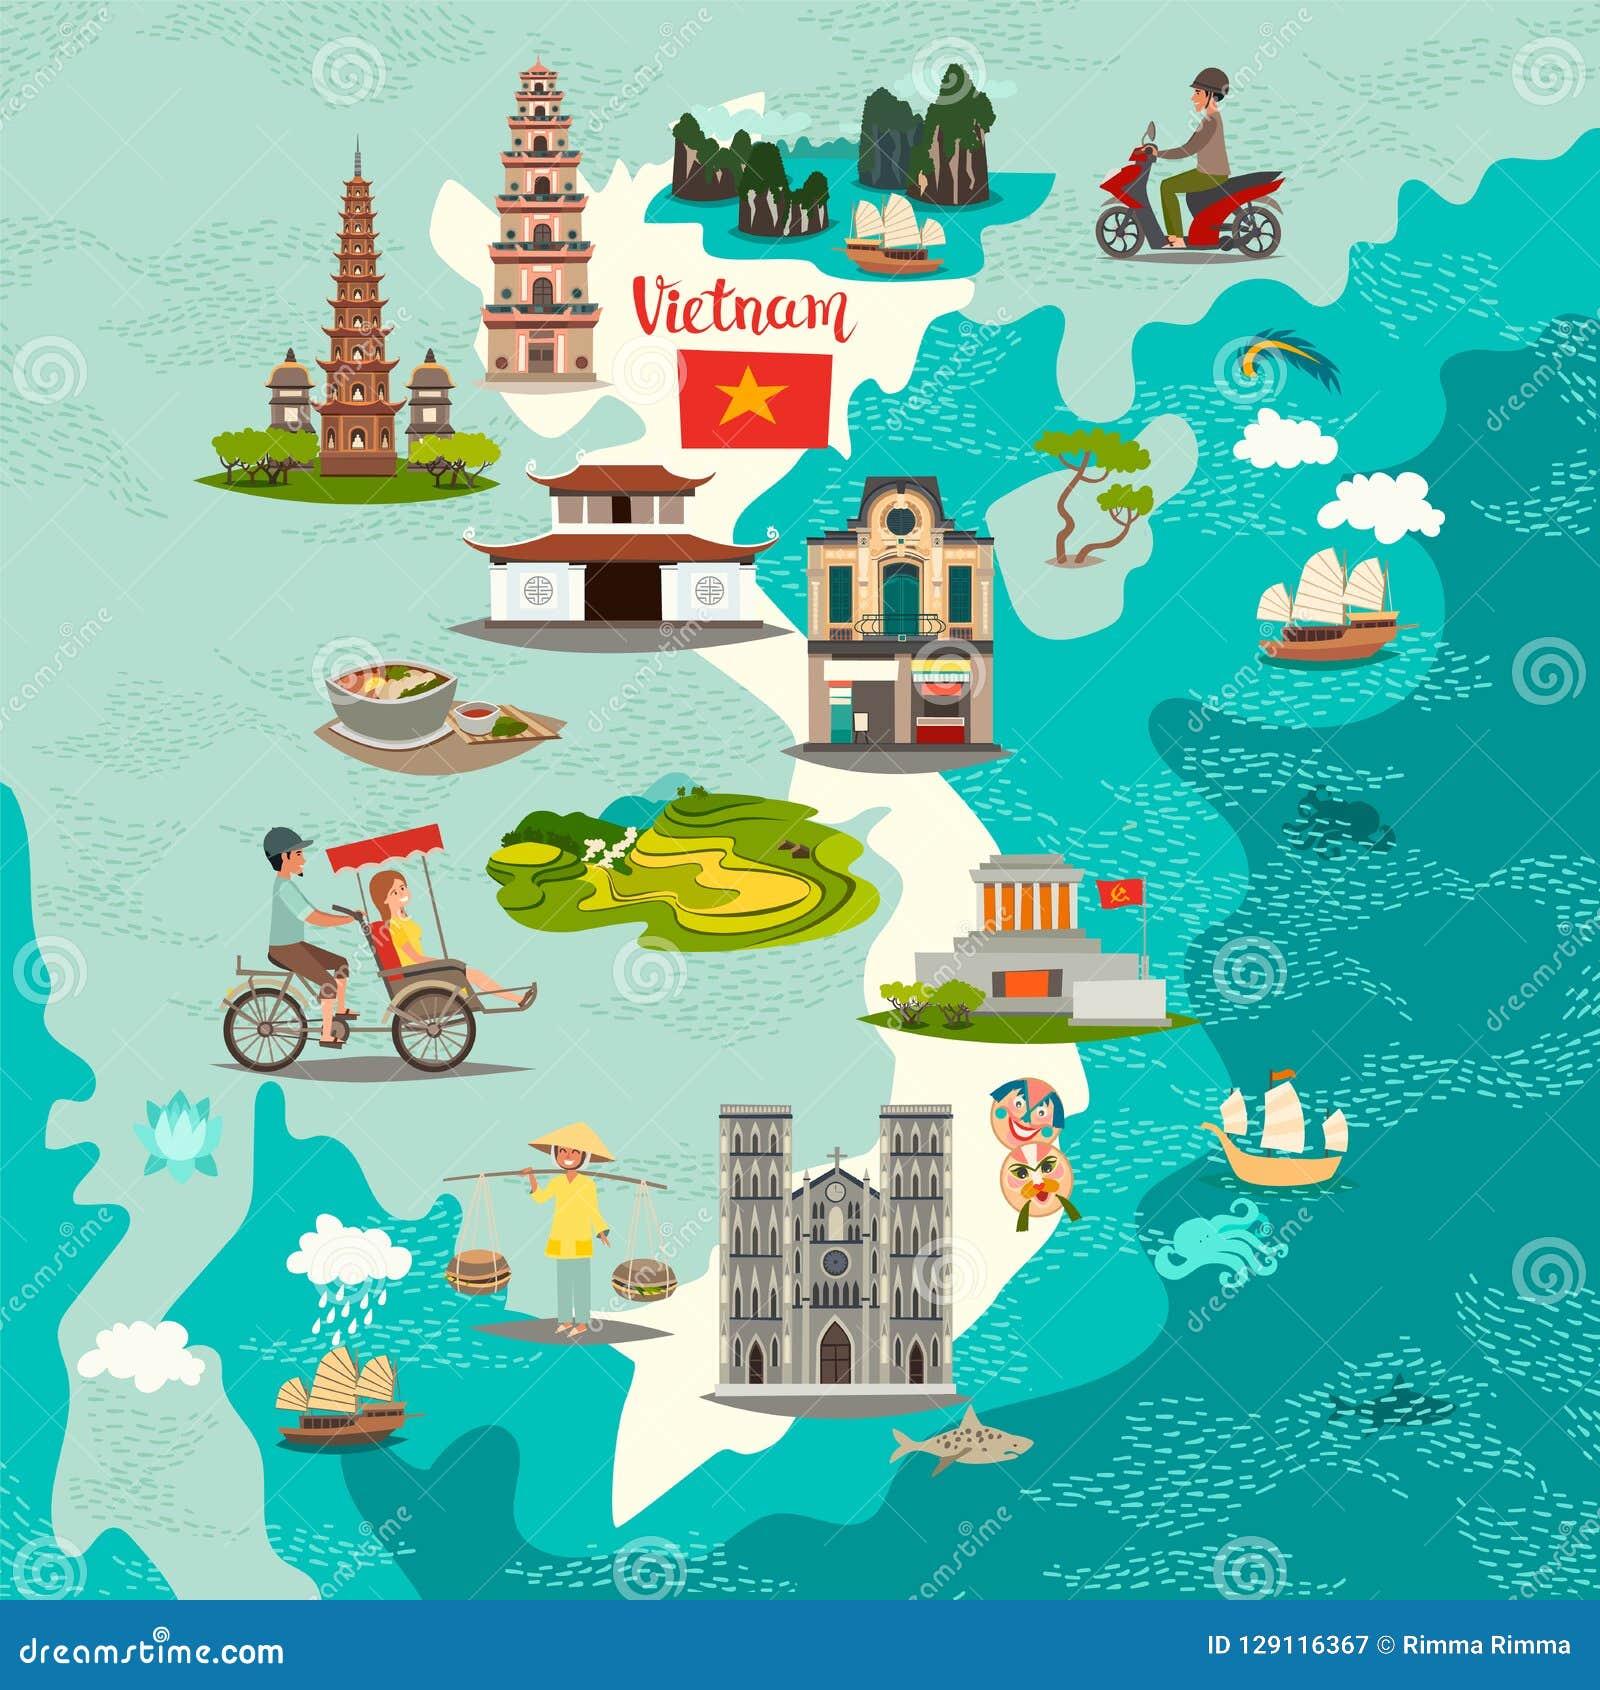 Vietnam Abstract Map, Hand Drawn Vector Illustration. Stock Vector ...